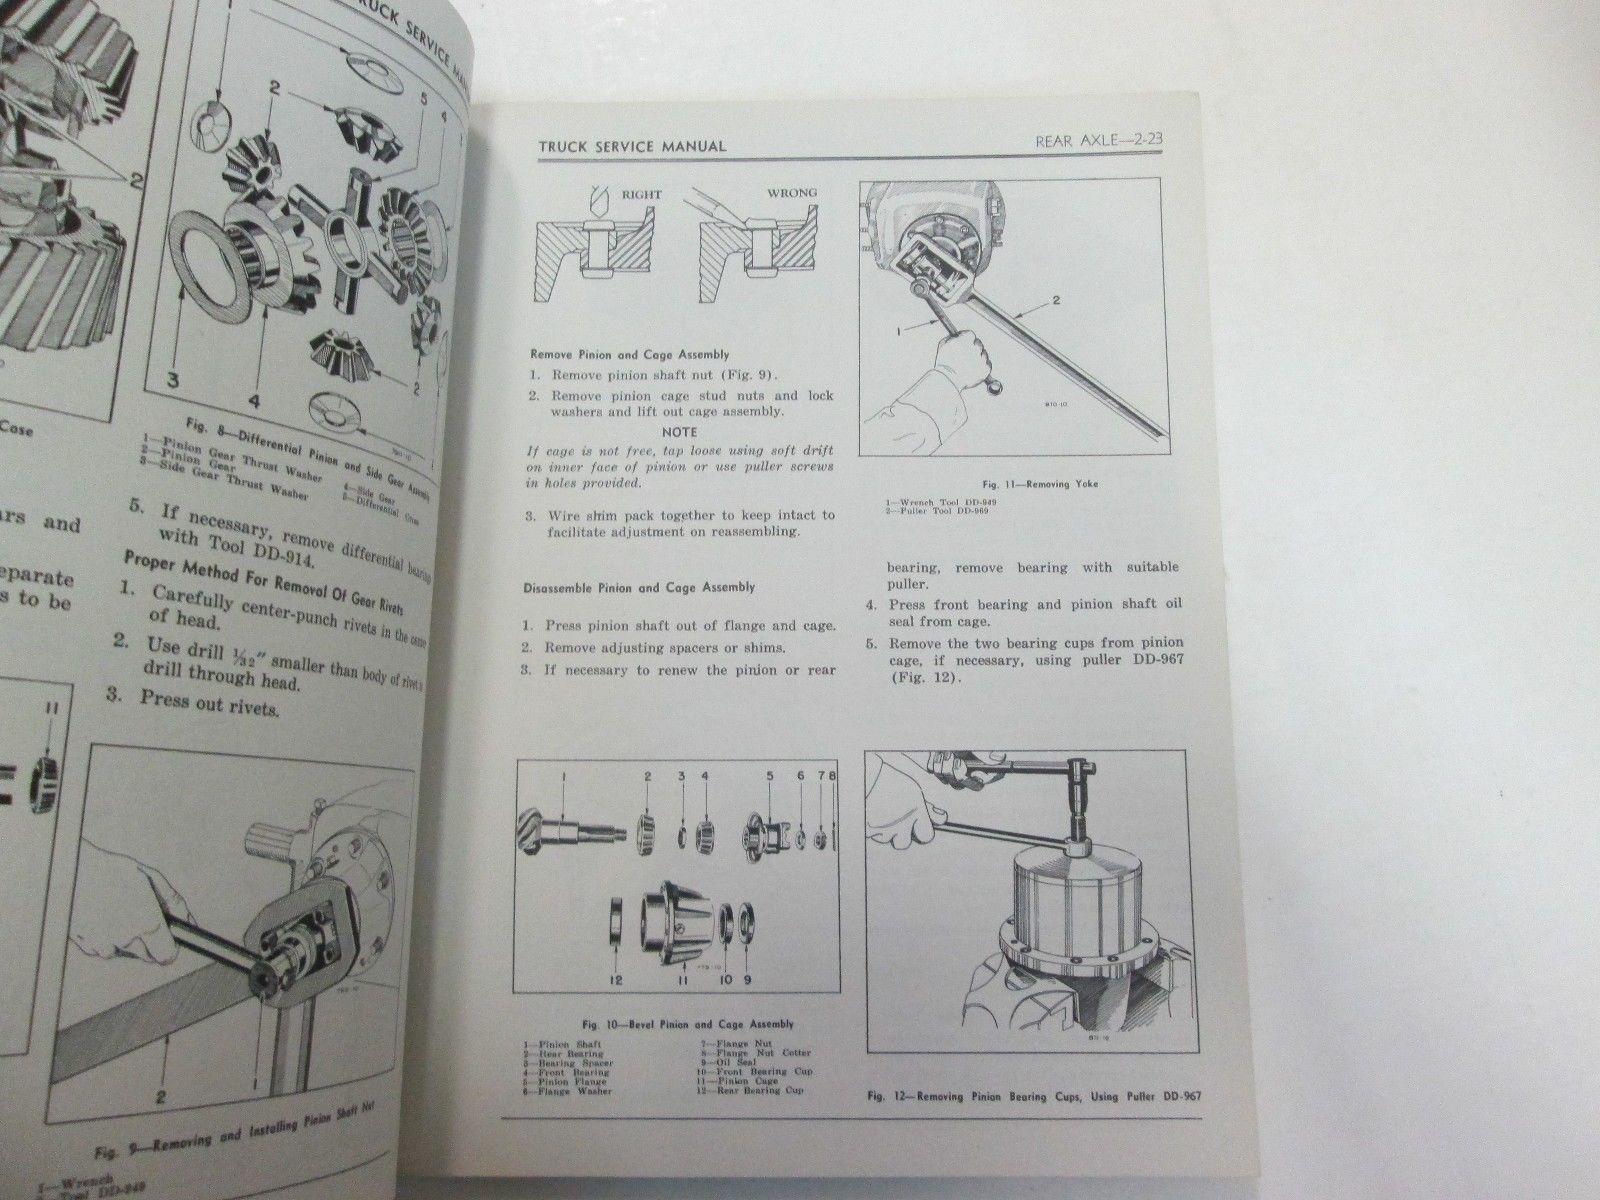 1959 Chrysler Truck Dodge Fargo D100 D300 400 500 700 FM6 FM8 Service Manual